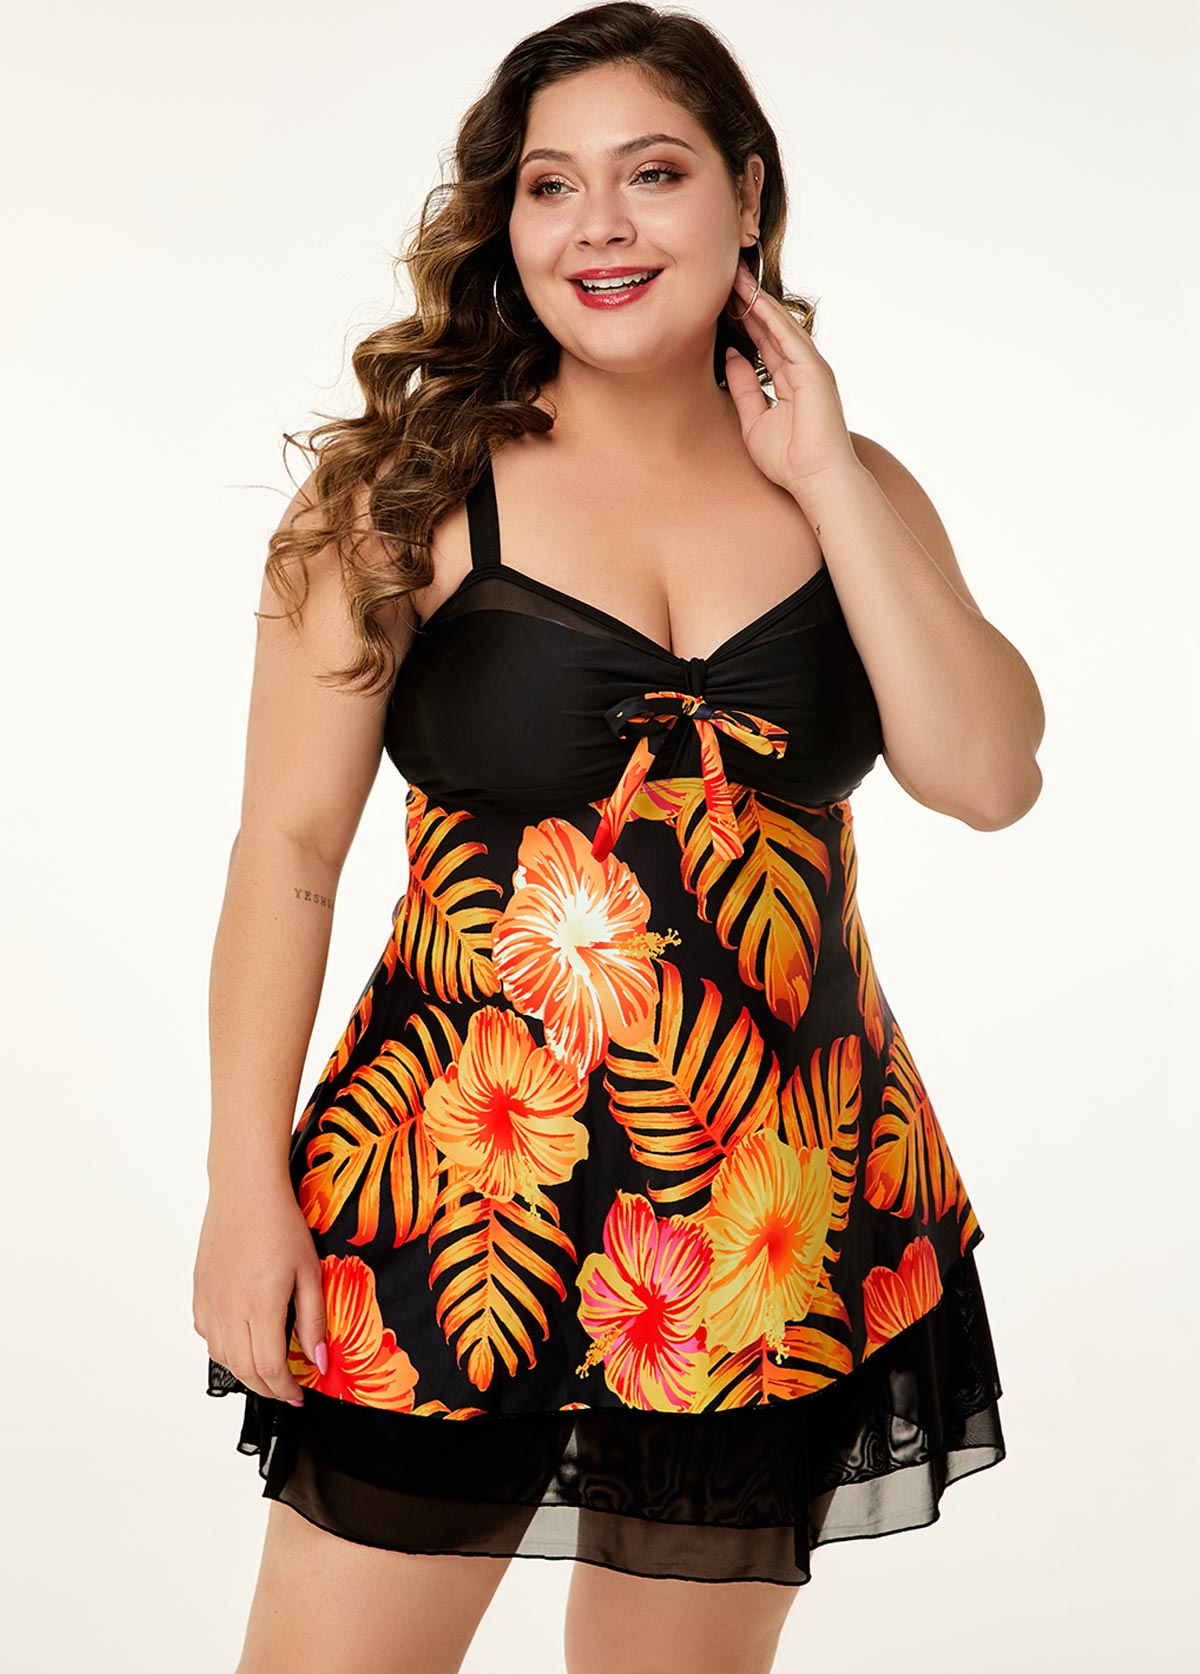 Flower Print Plus Size Mesh splicing Swimdress and Shorts